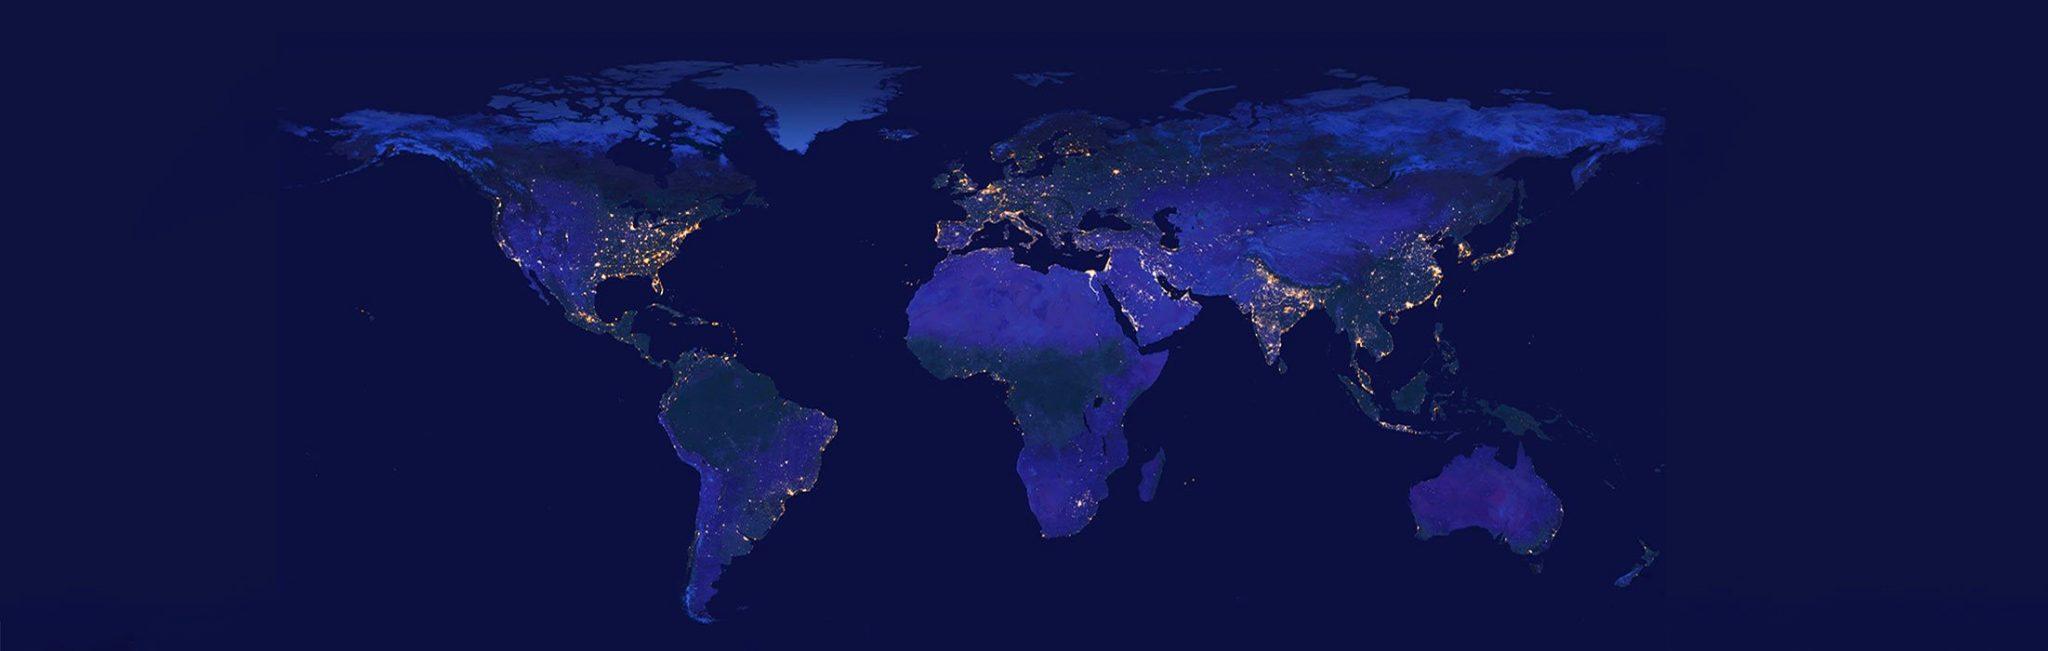 IML Digital Media - light up your world.